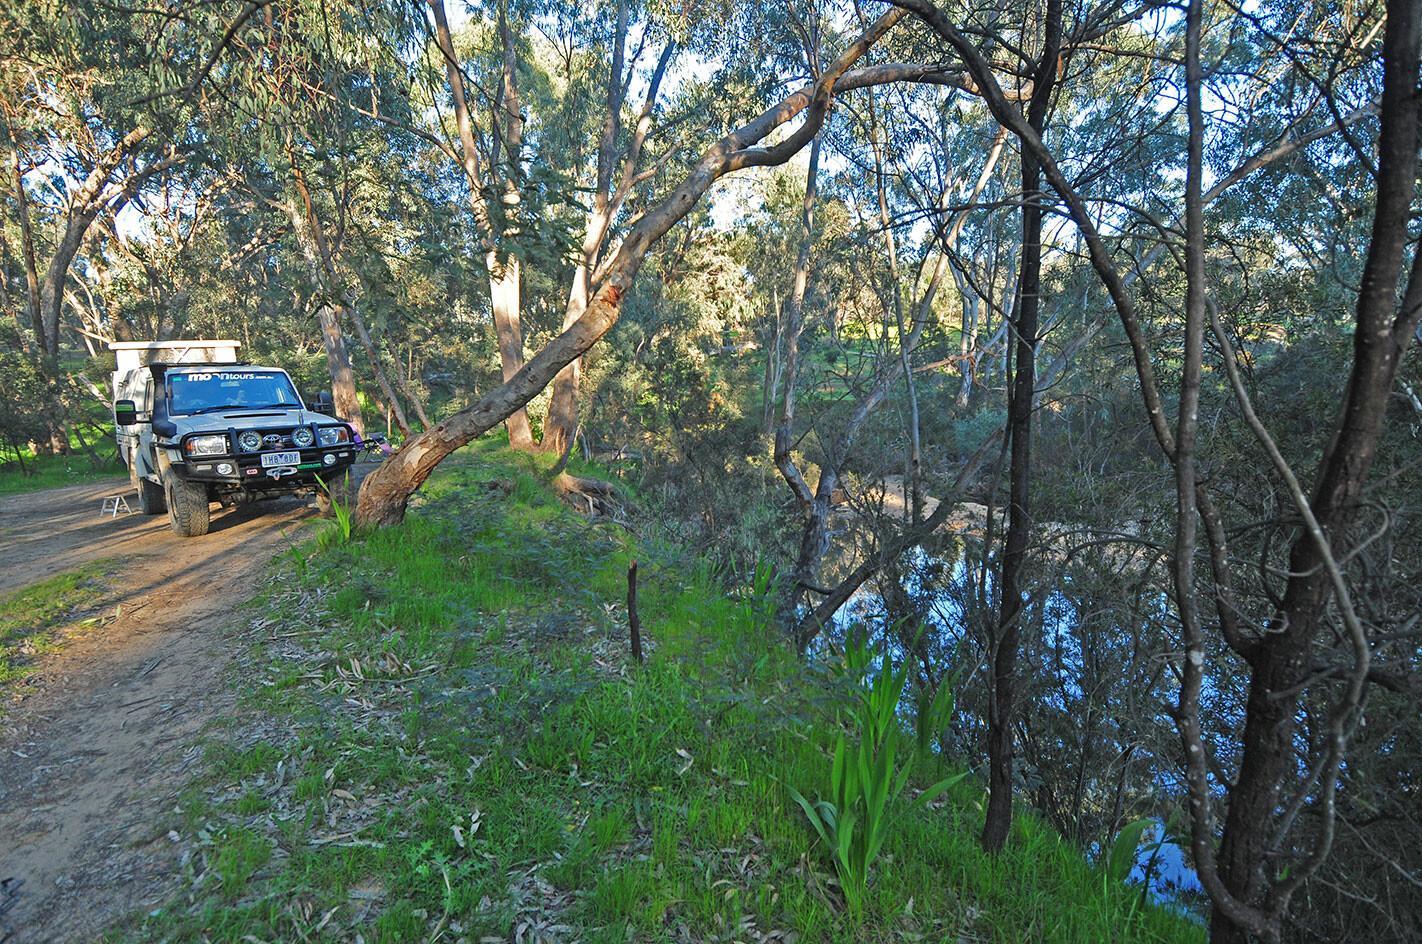 Reedy Creek Campe